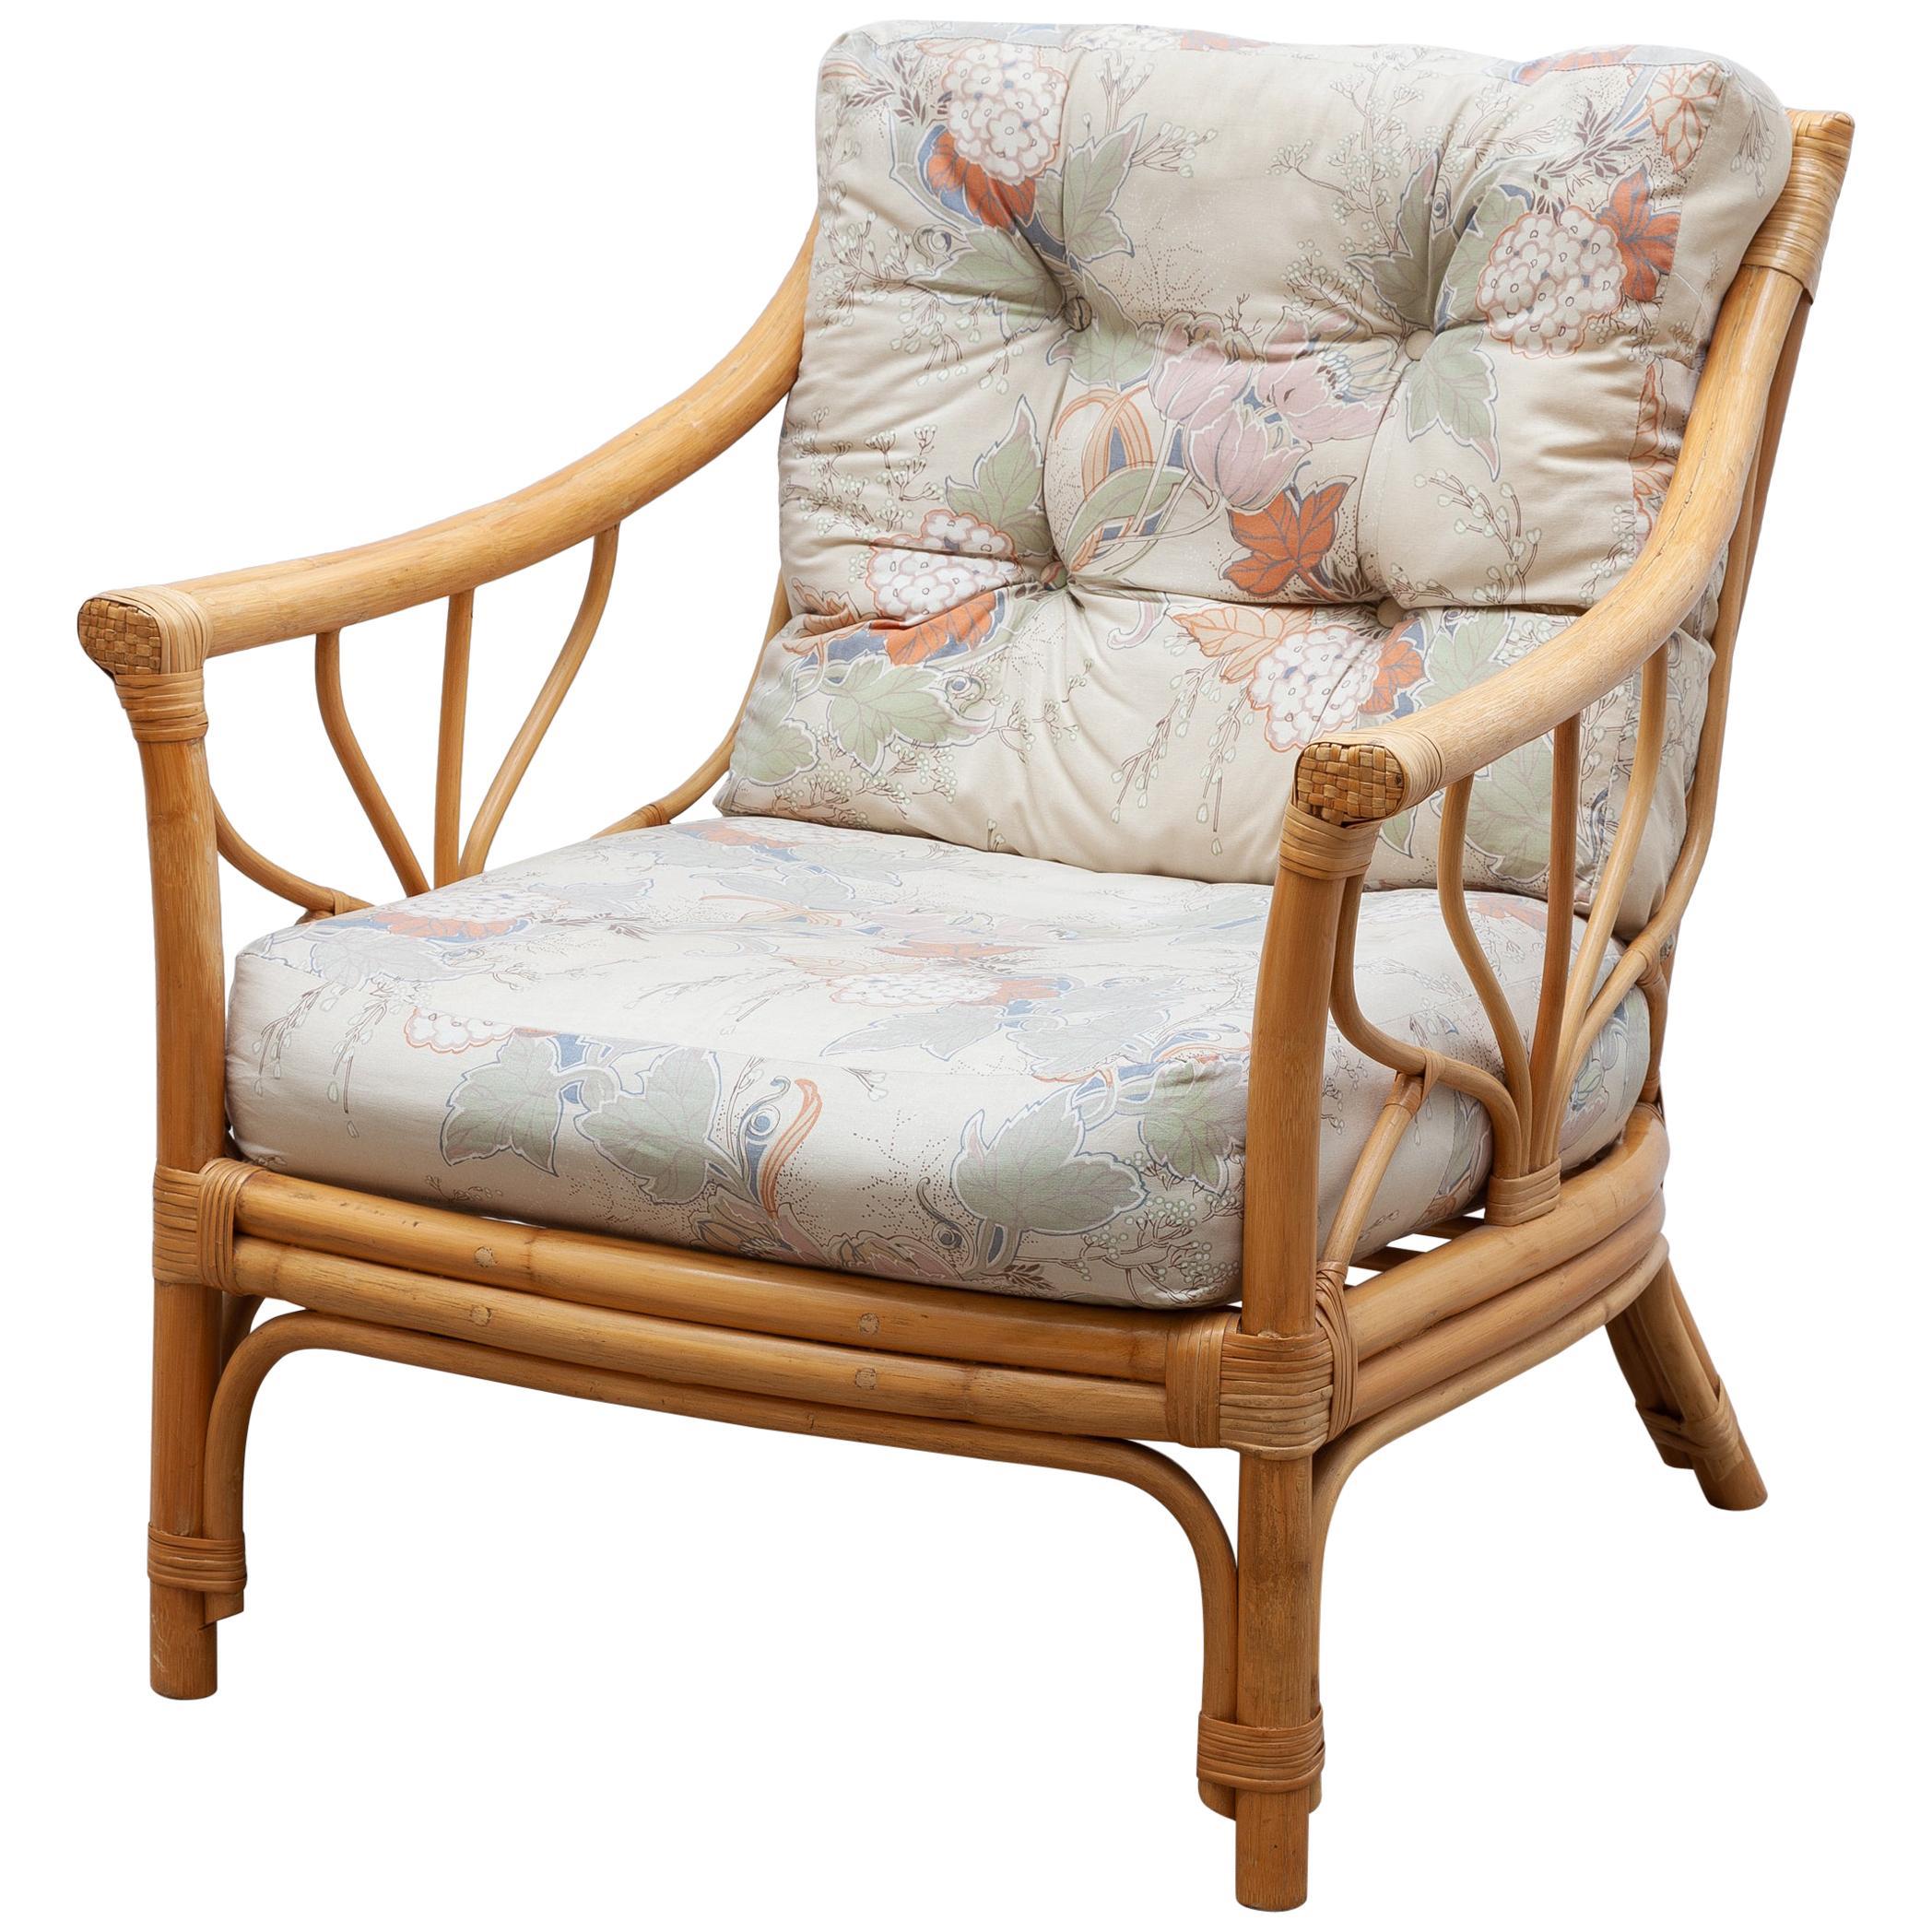 Italian Bamboo Lounge Chair, 1970s